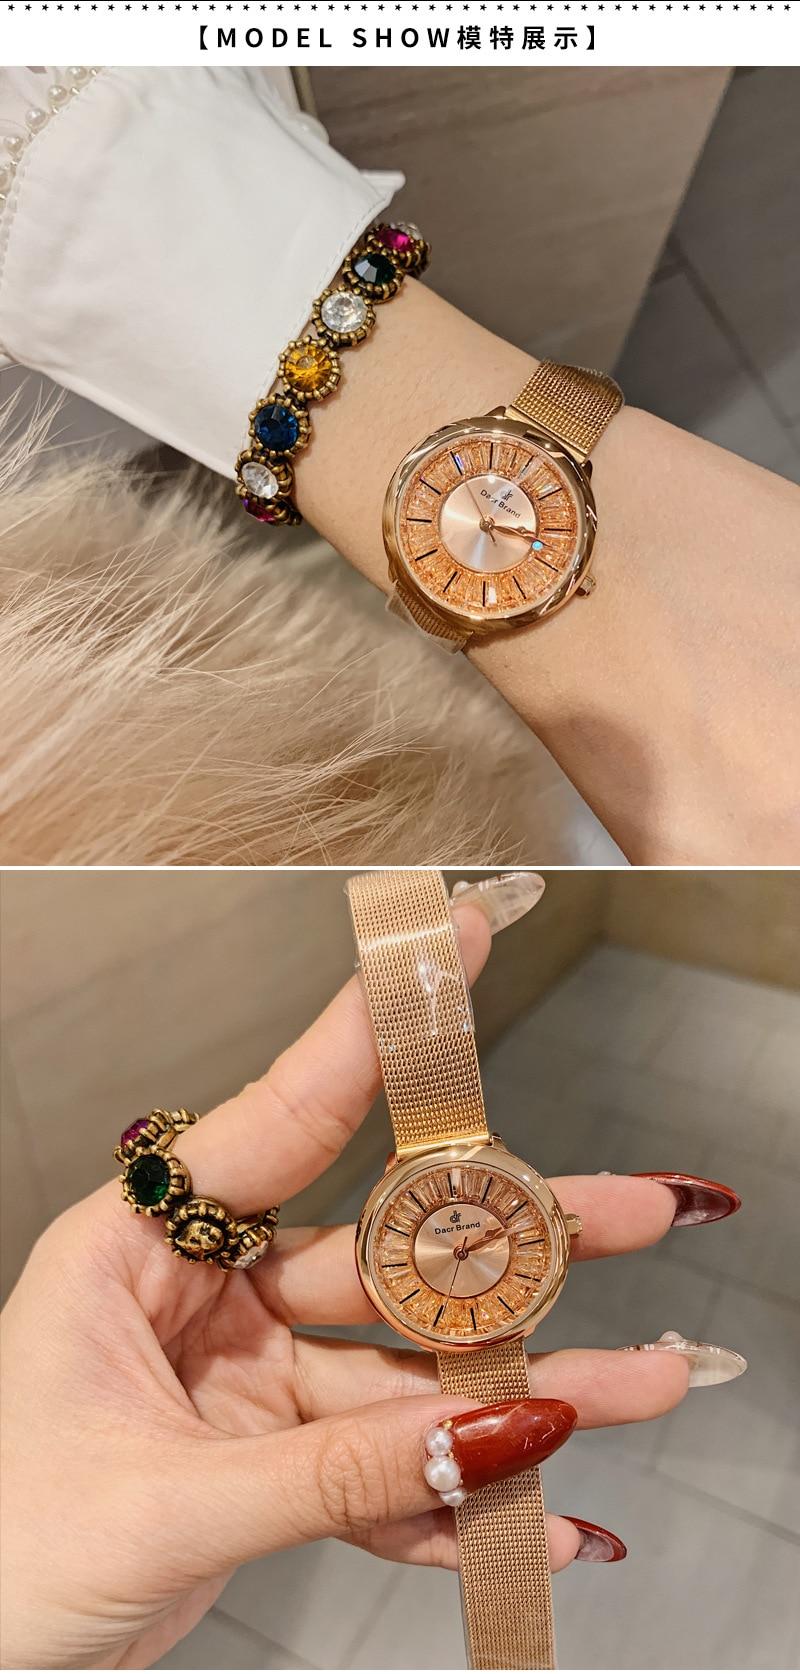 diamantes dial relógio feminino ins venda quente